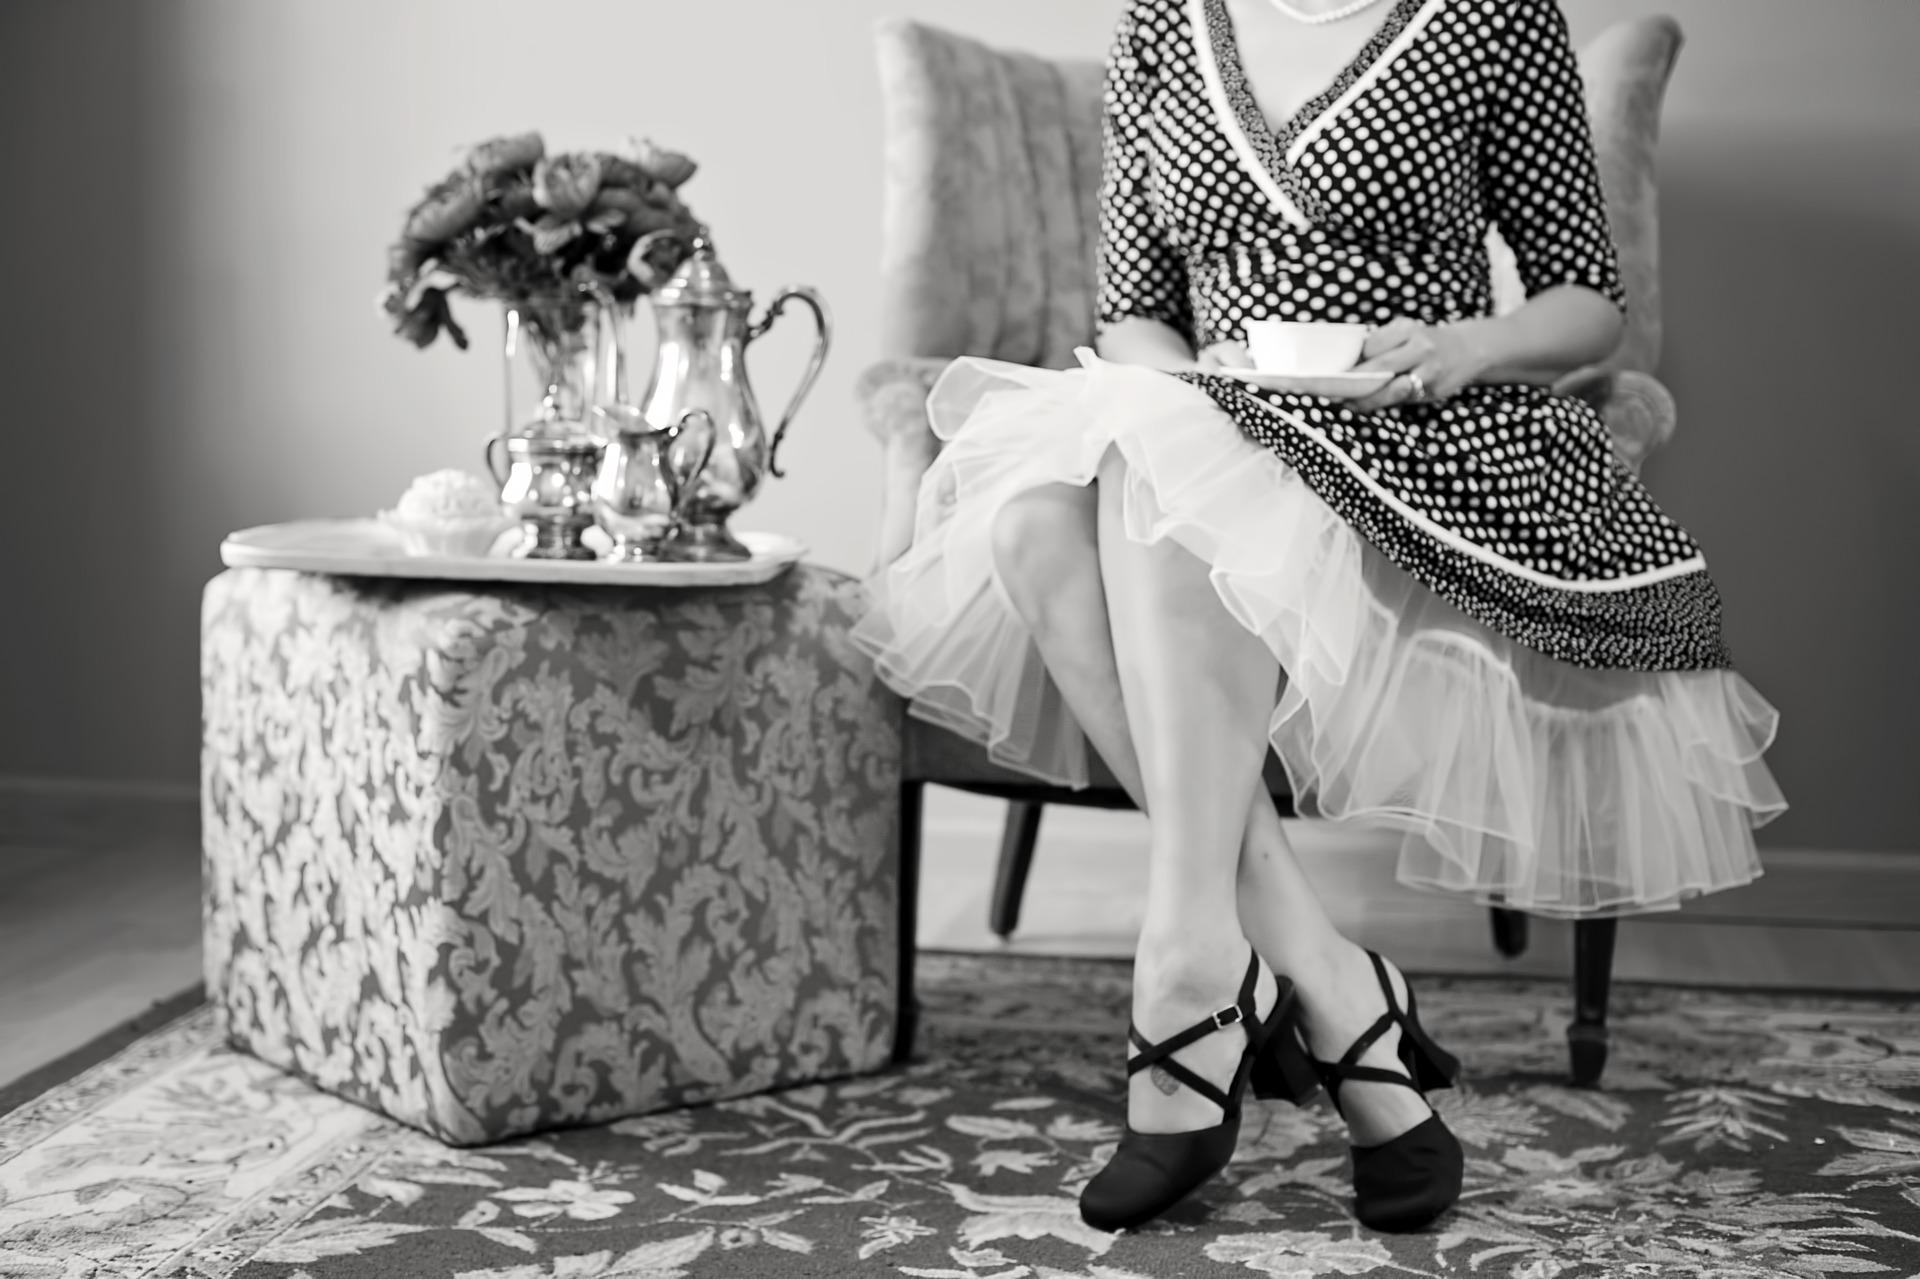 tea-party-1001653_1920.jpg